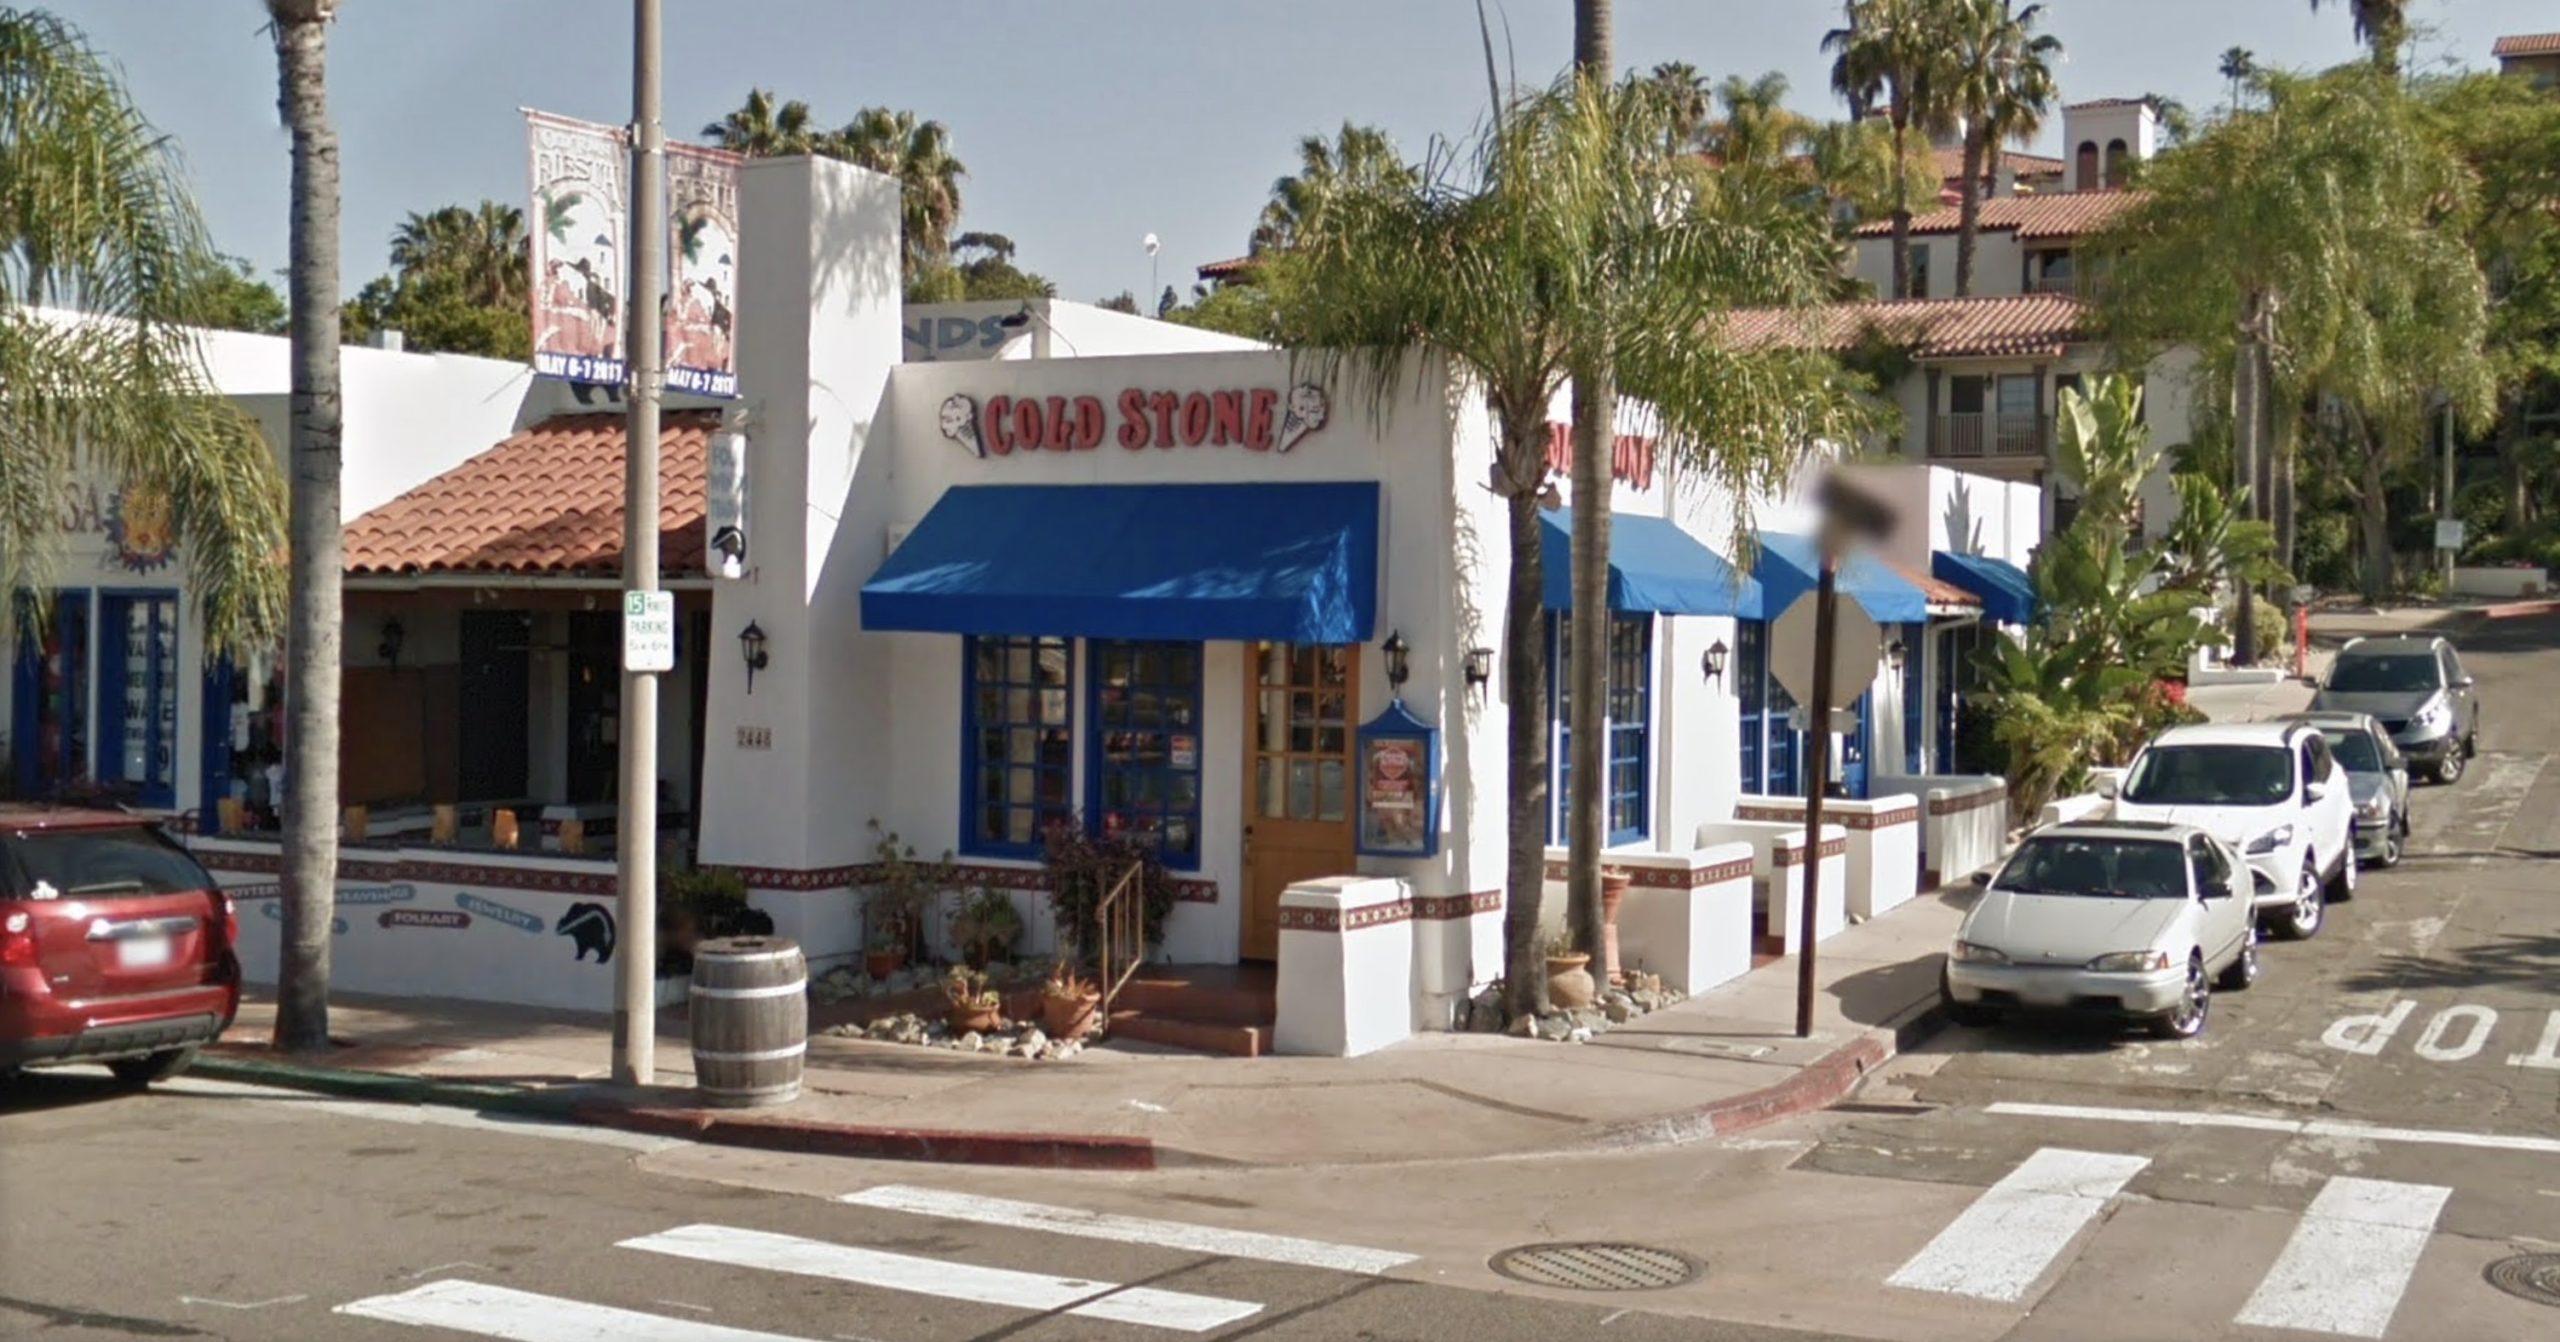 New Listing High Volume Cold Stone Creamery San Diego Ca Old Town San Diego Eatz Associates